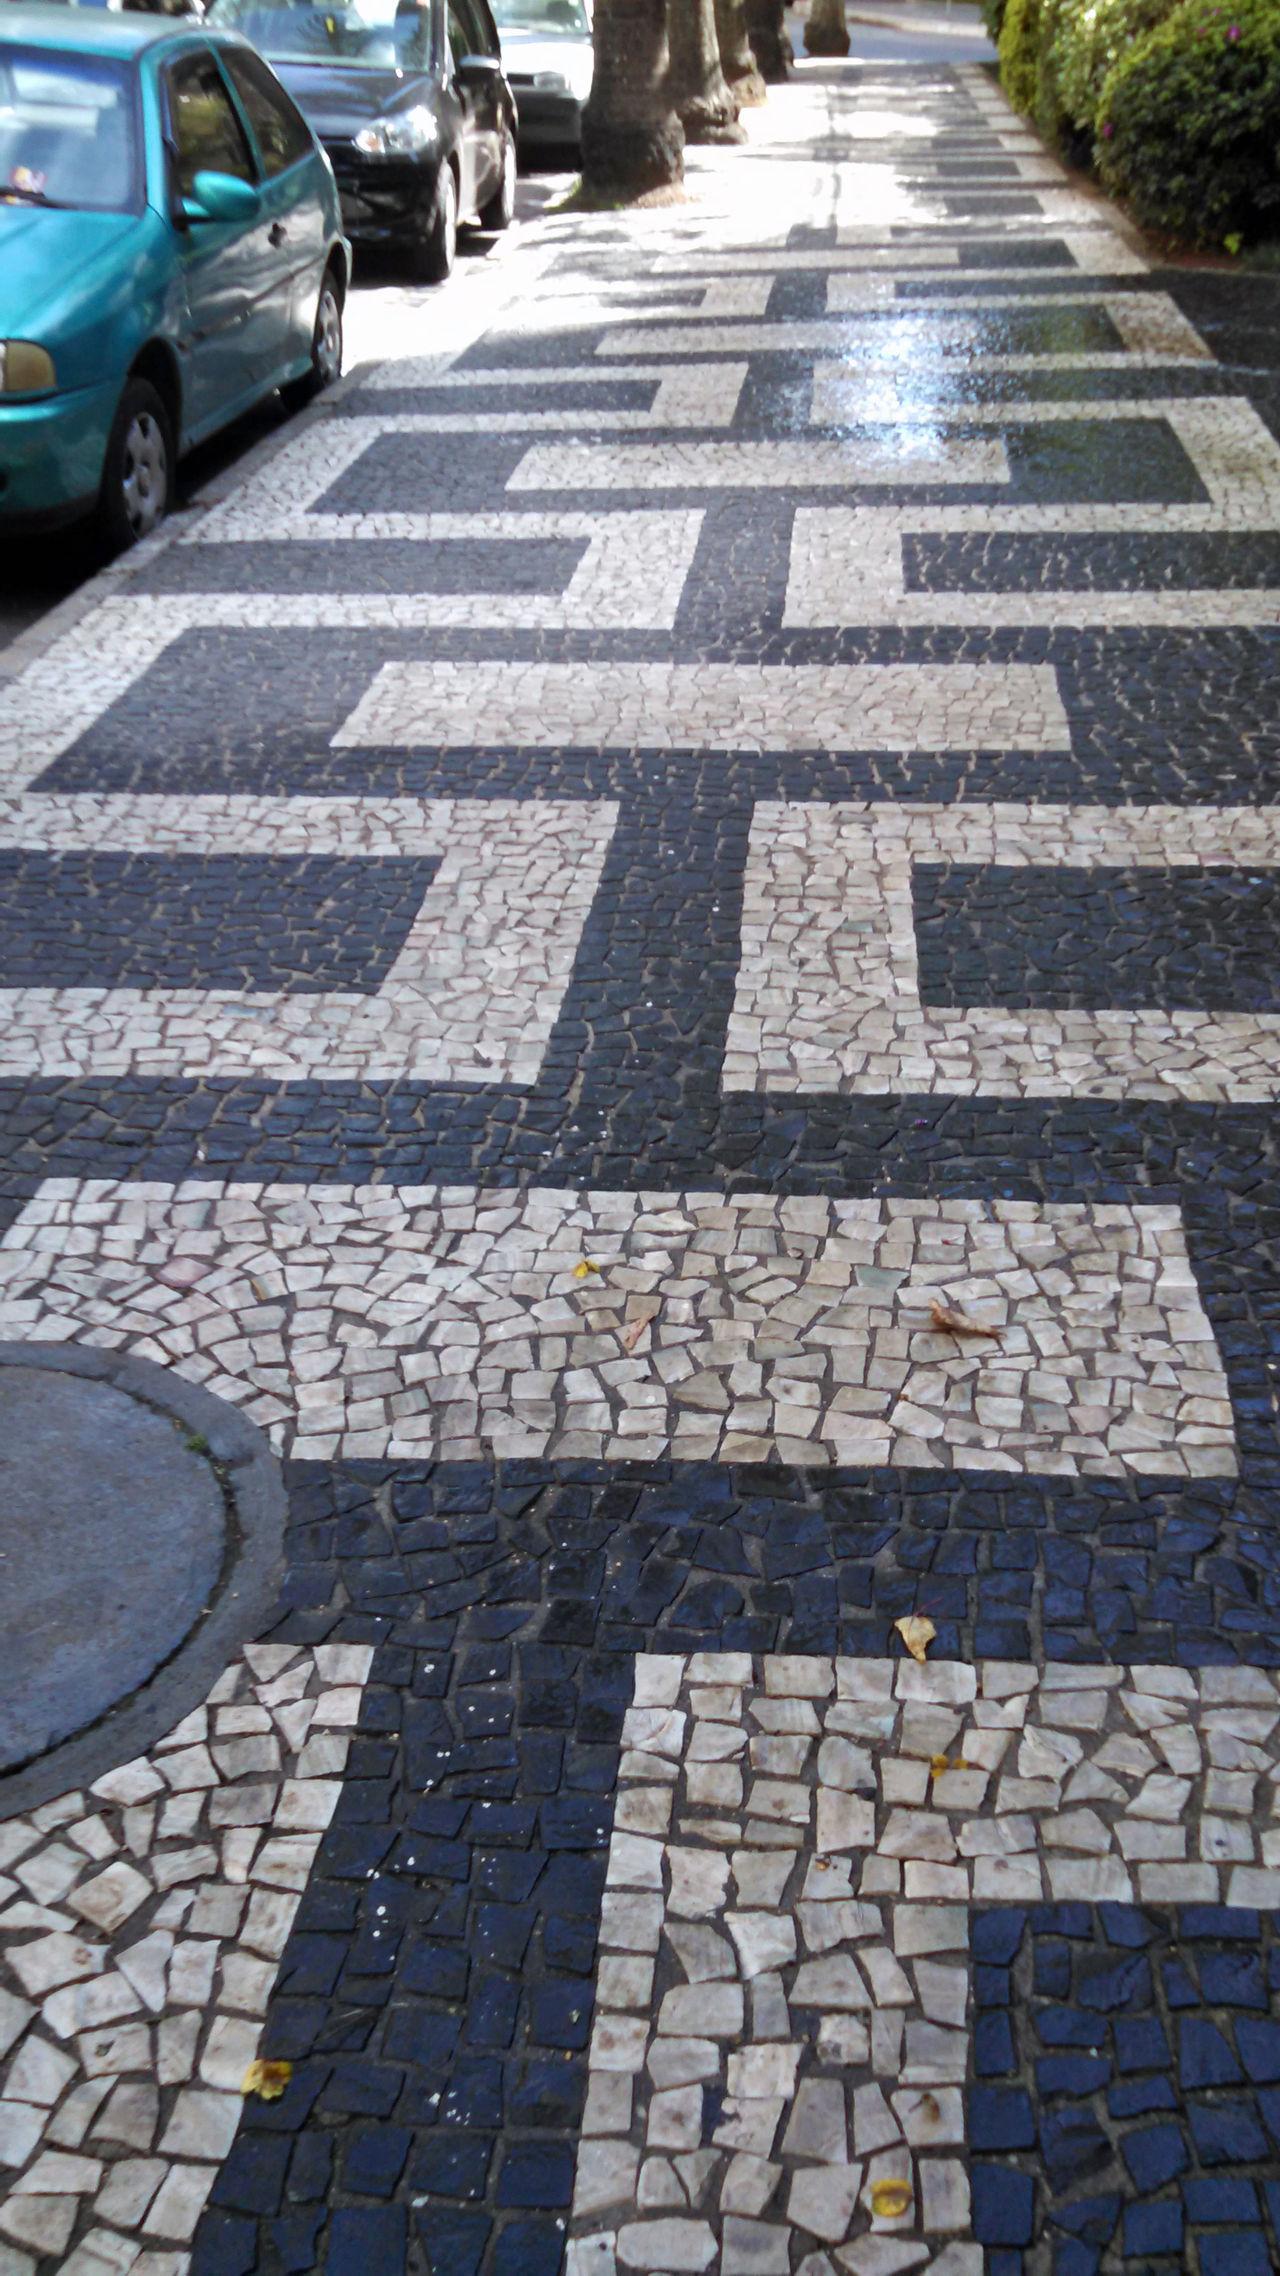 Art Artistic ArtWork City Day No People Outdoors Pattern Rocks Sidewalk Texture The Way Forward